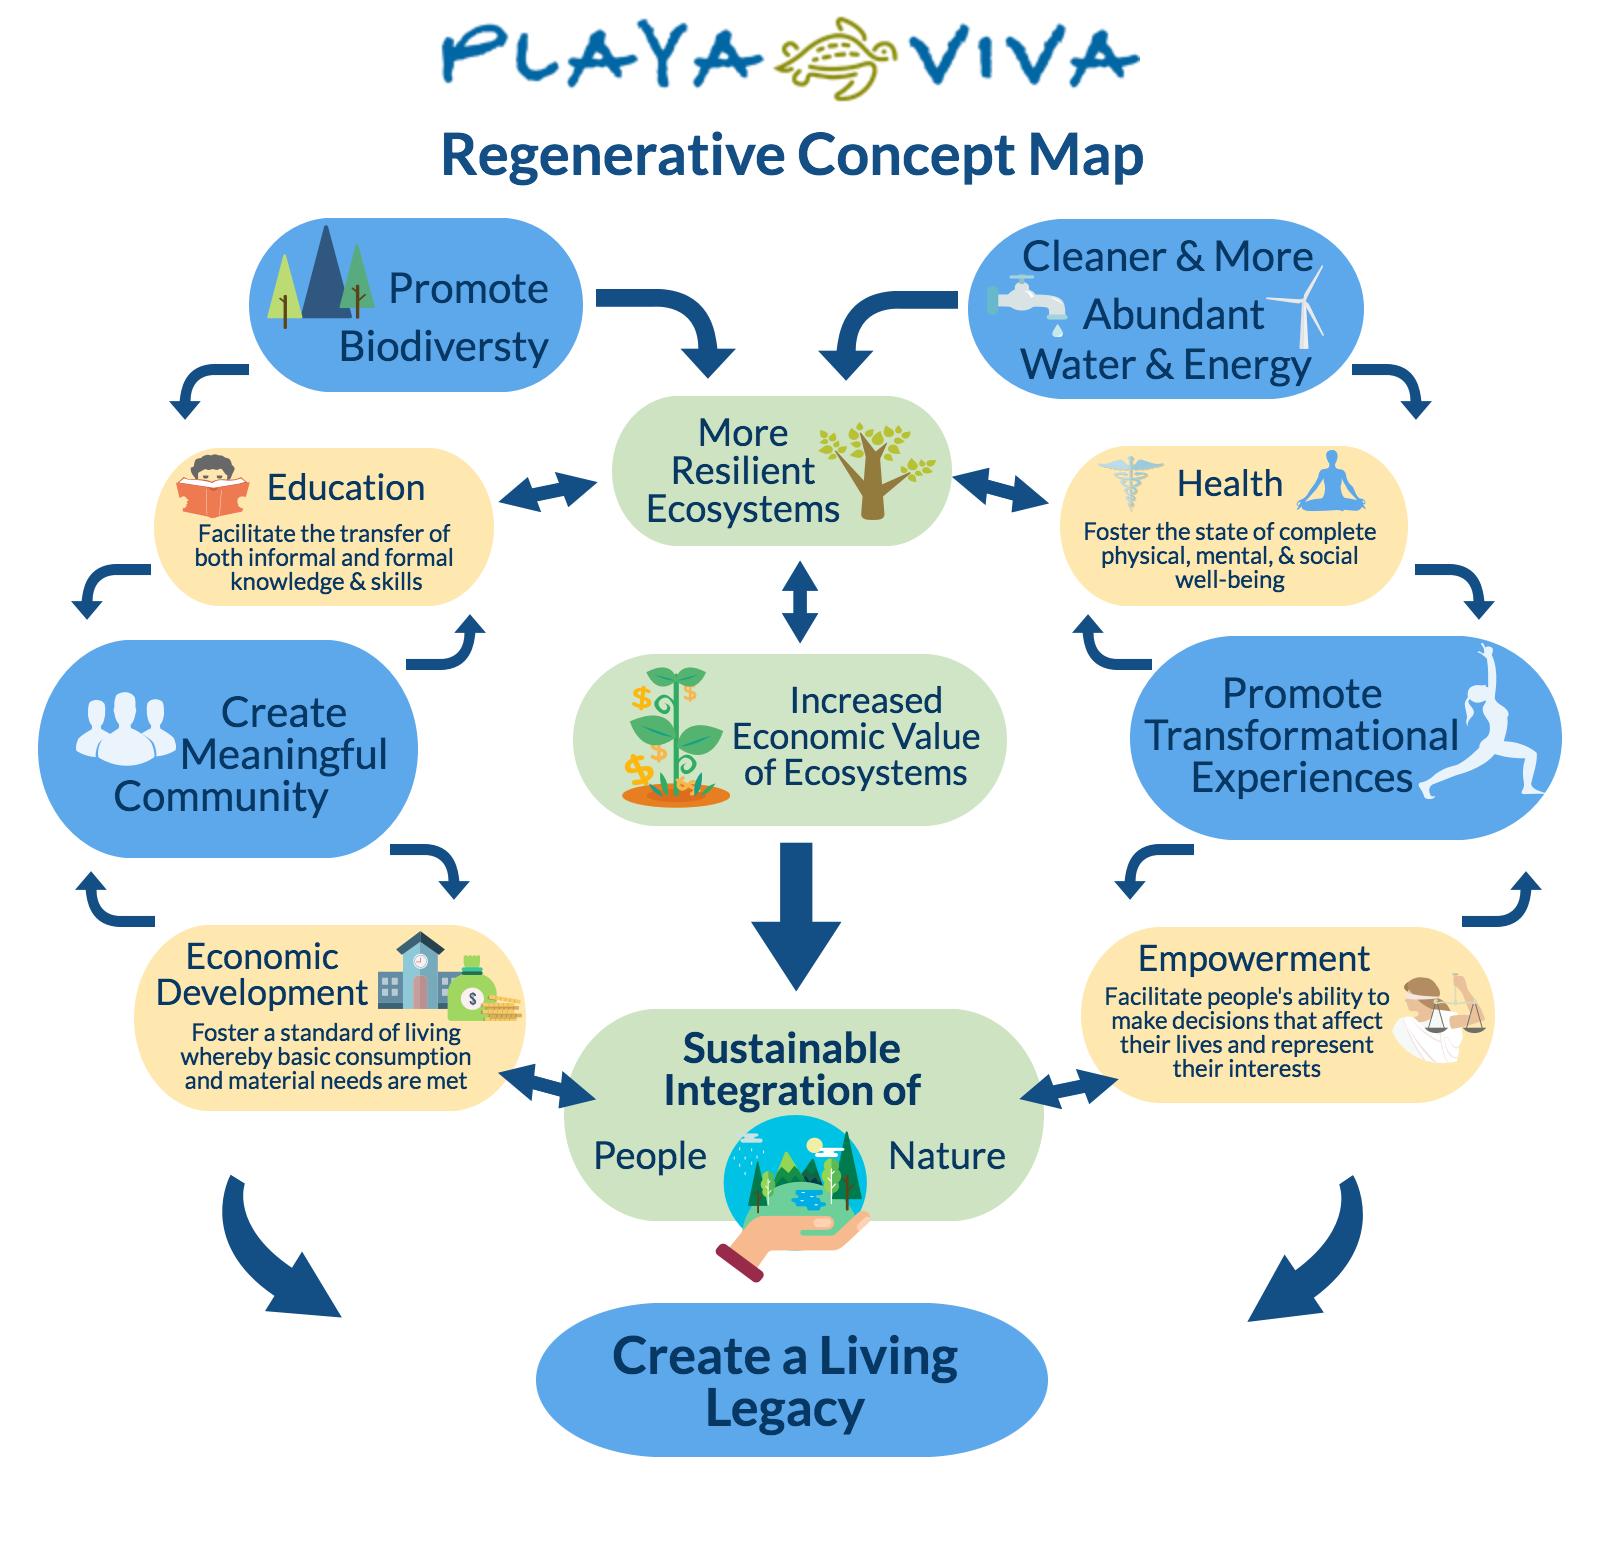 pv-regenerative-concept-map2